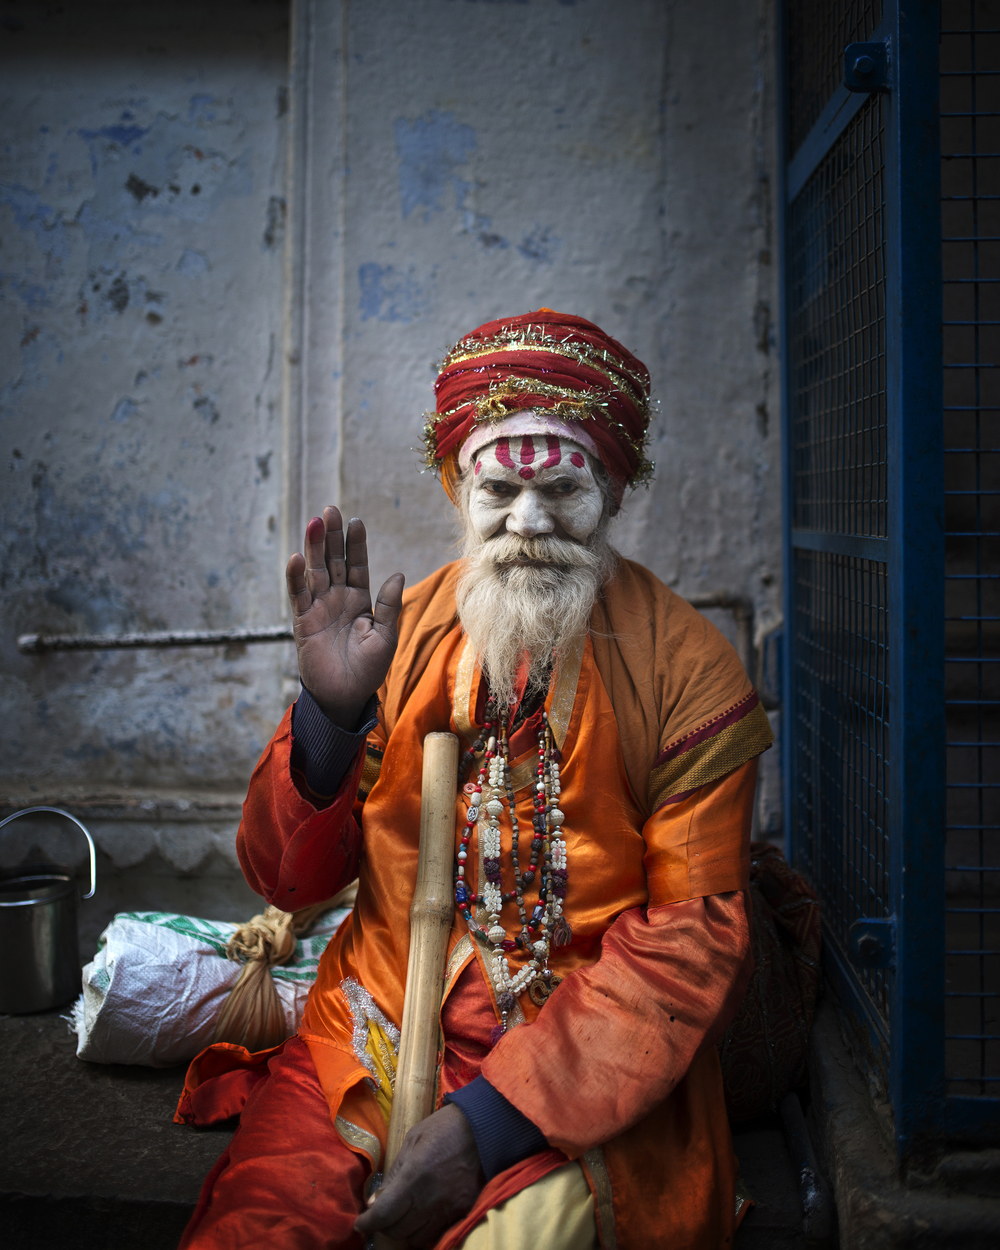 20151216 - Varanasi (Priest).jpg